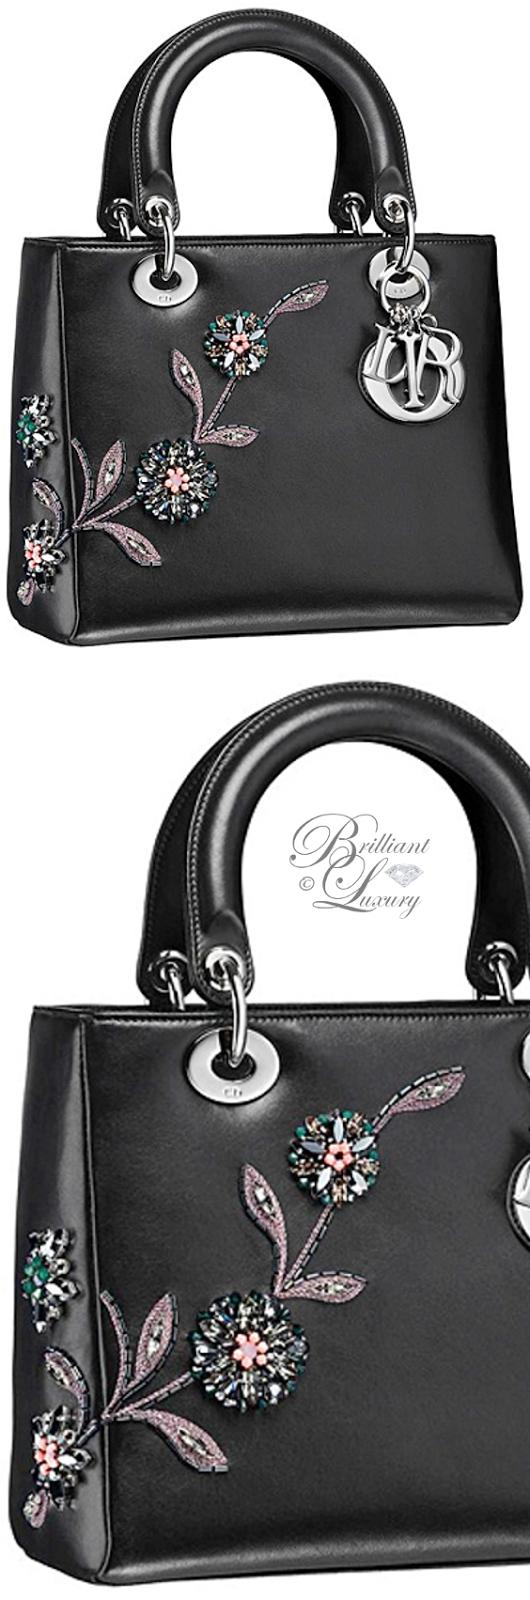 Brilliant Luxury ♦ Dior Lady Dior 'Embroidered Black Lambskin' Bag